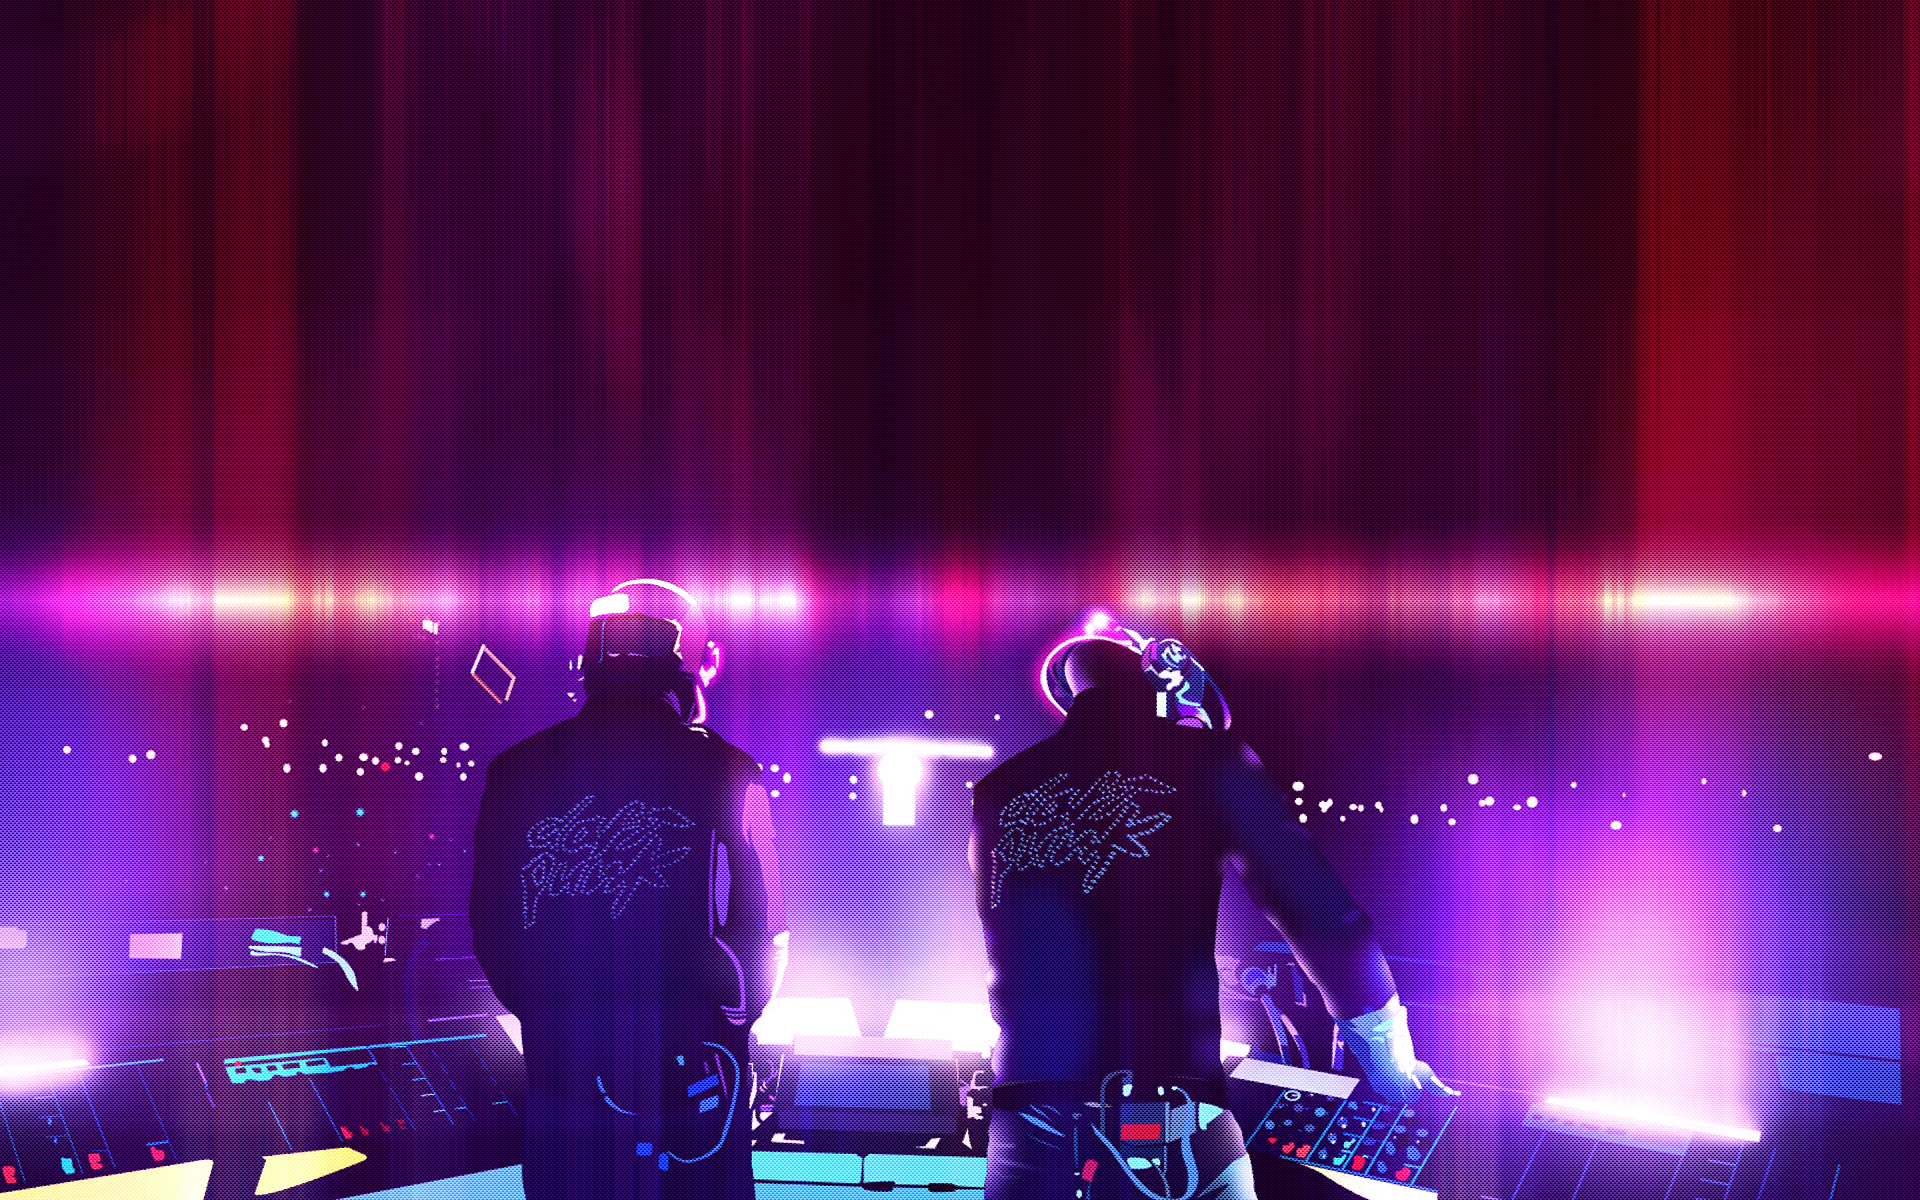 DJ Background Free Downloads